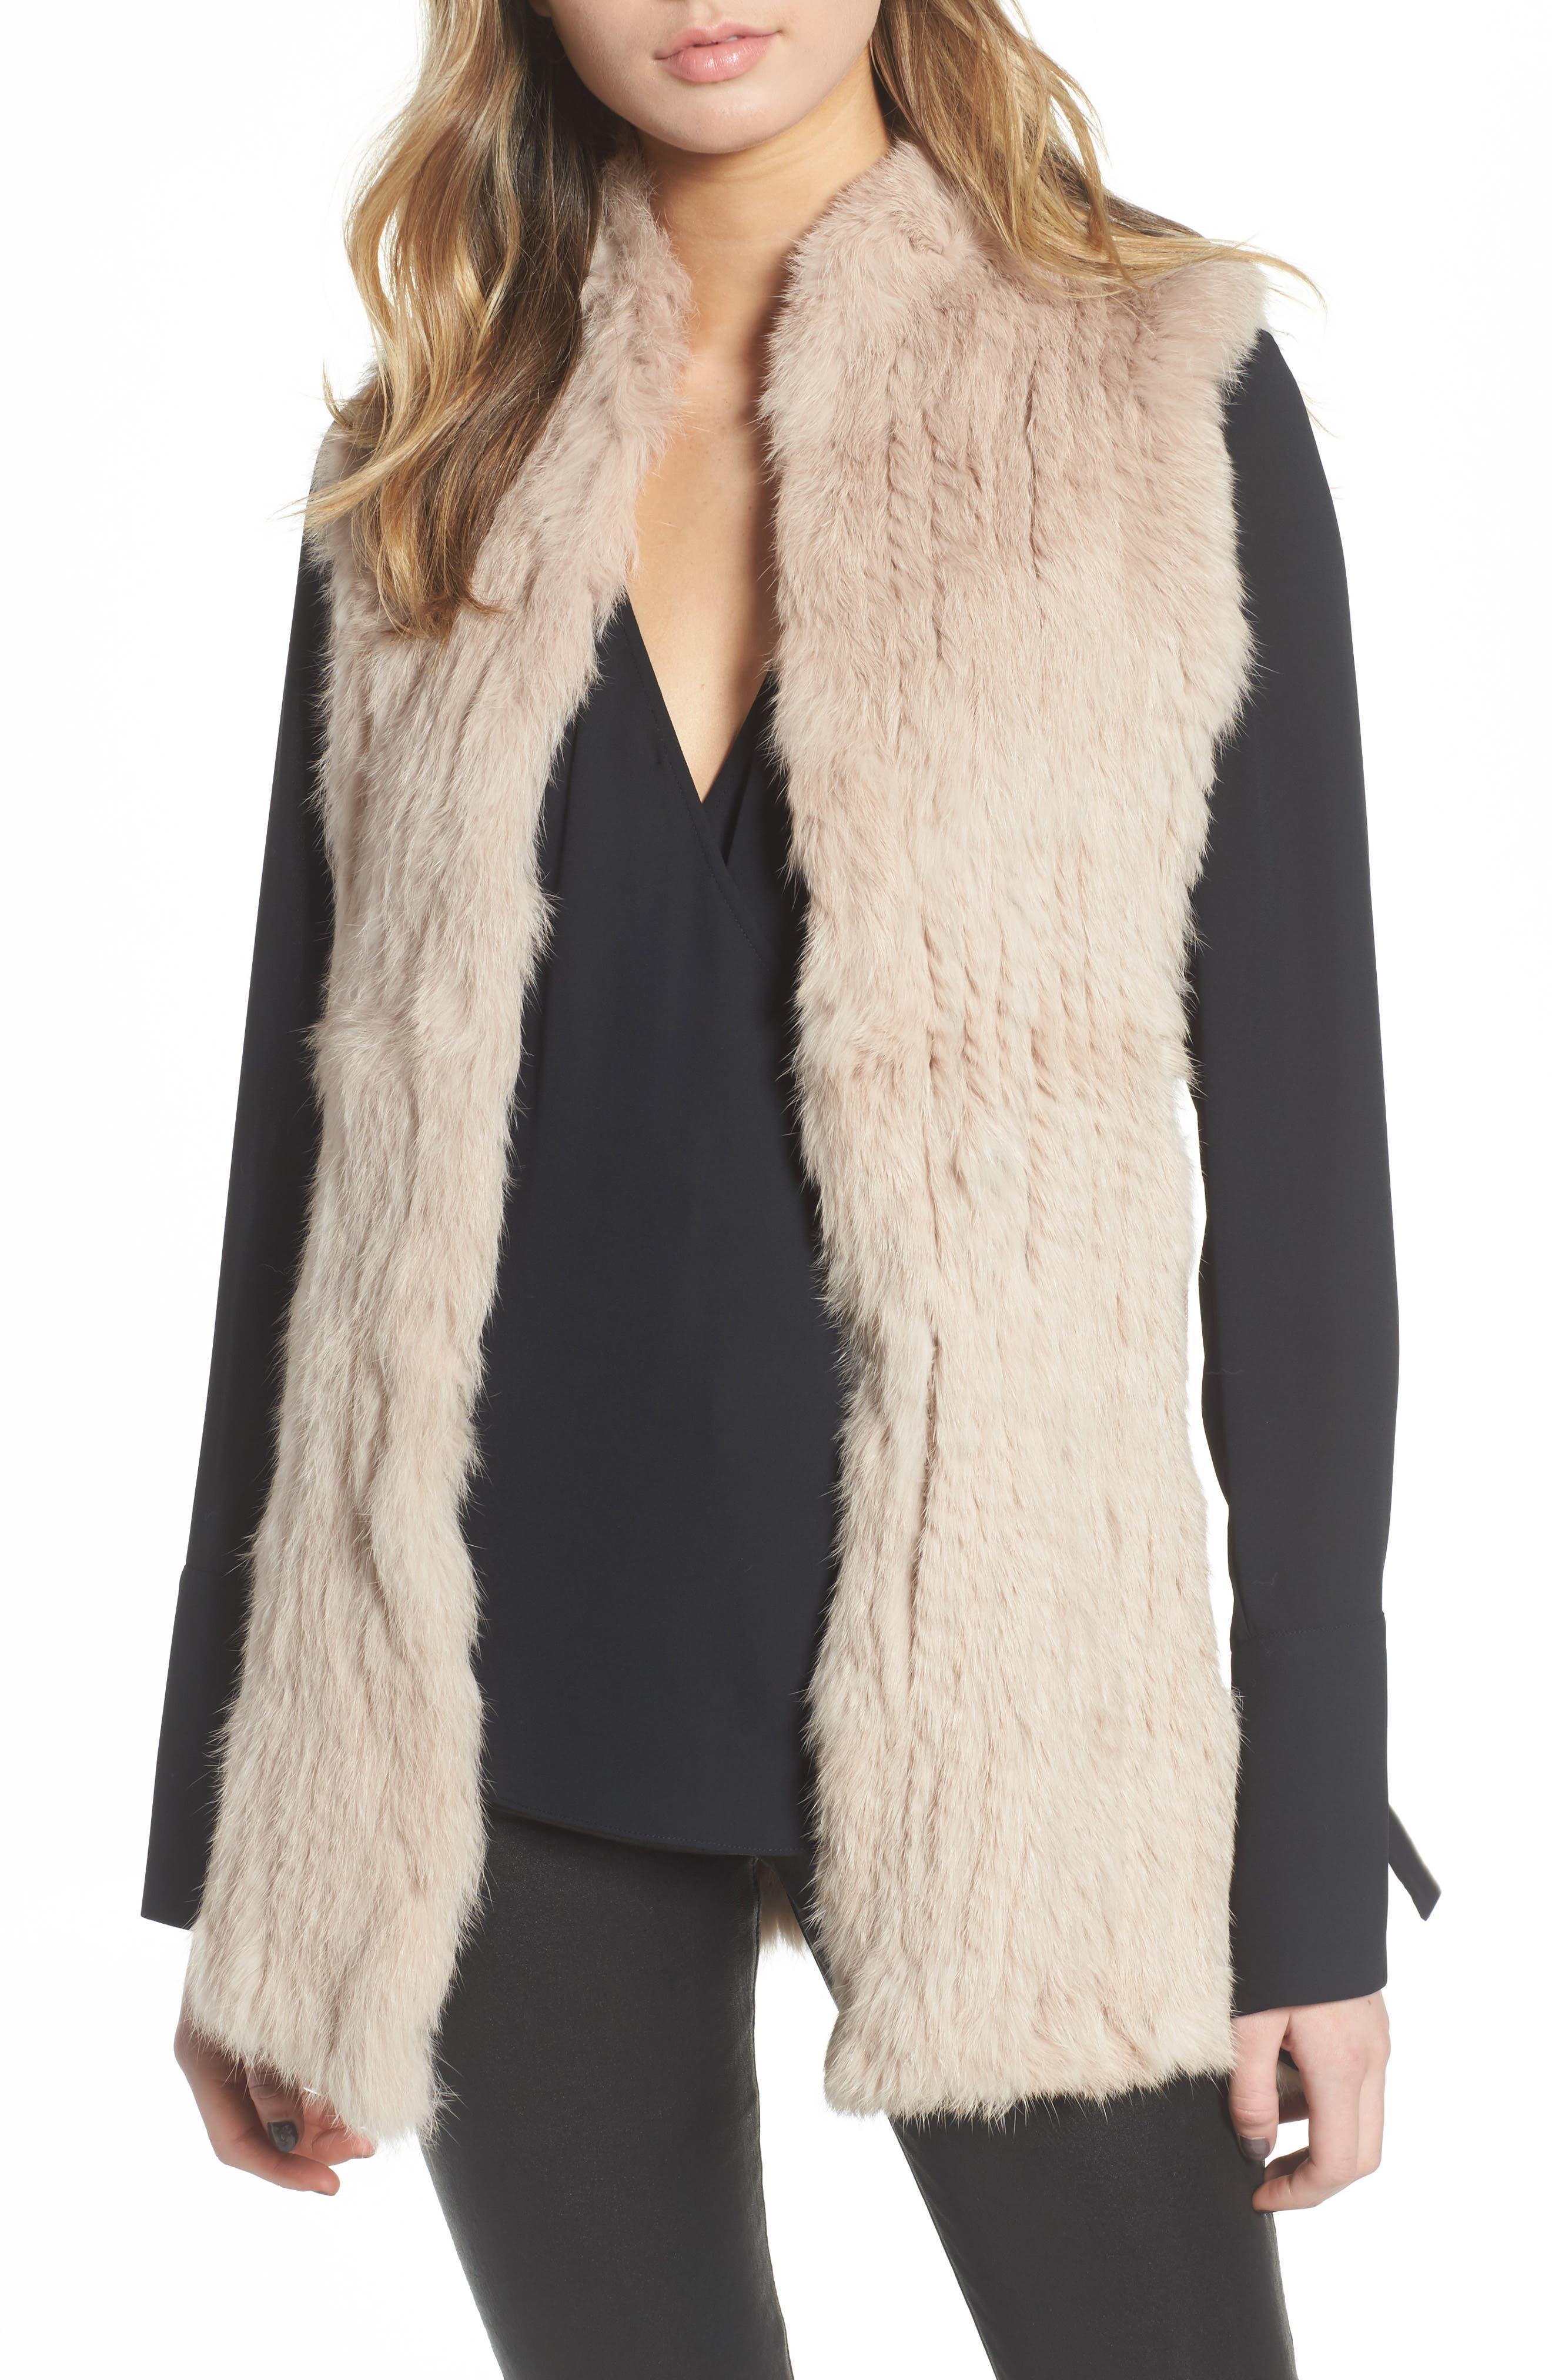 Alternate Image 1 Selected - Love Token Genuine Rabbit Fur & Knit Vest (Nordstrom Exclusive)